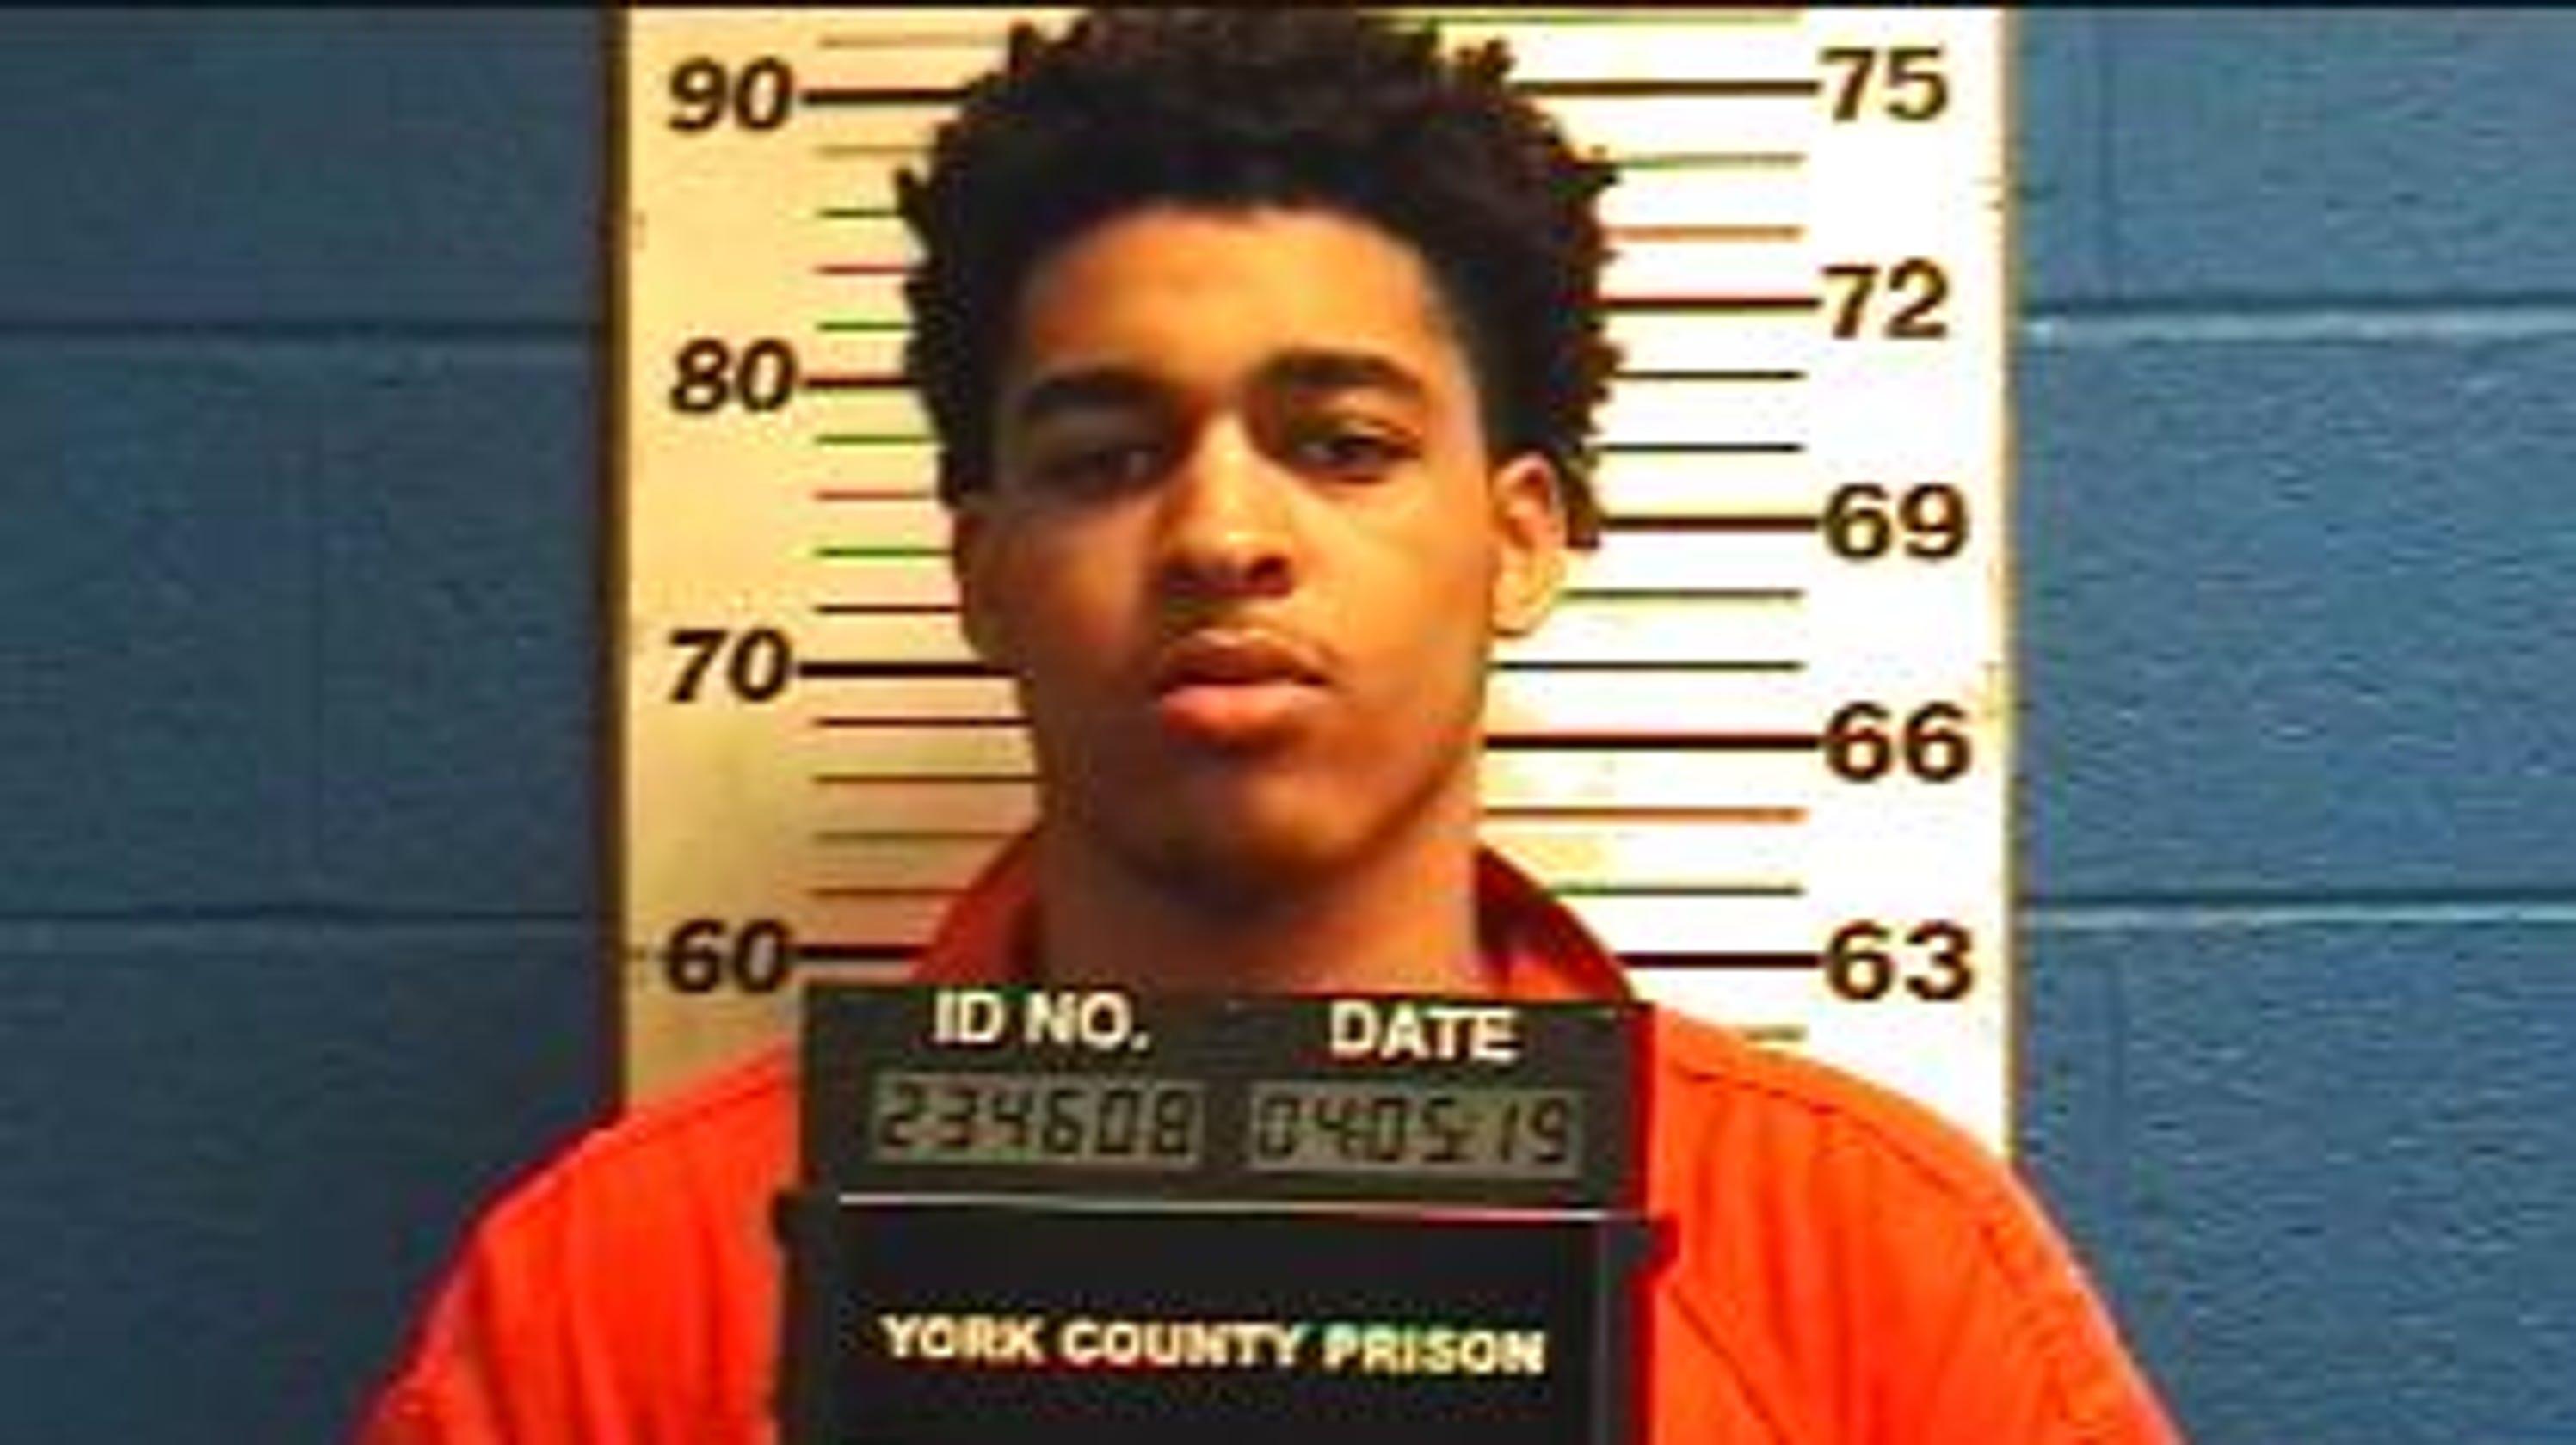 York shooting suspect arrested in heroin buy, DA says